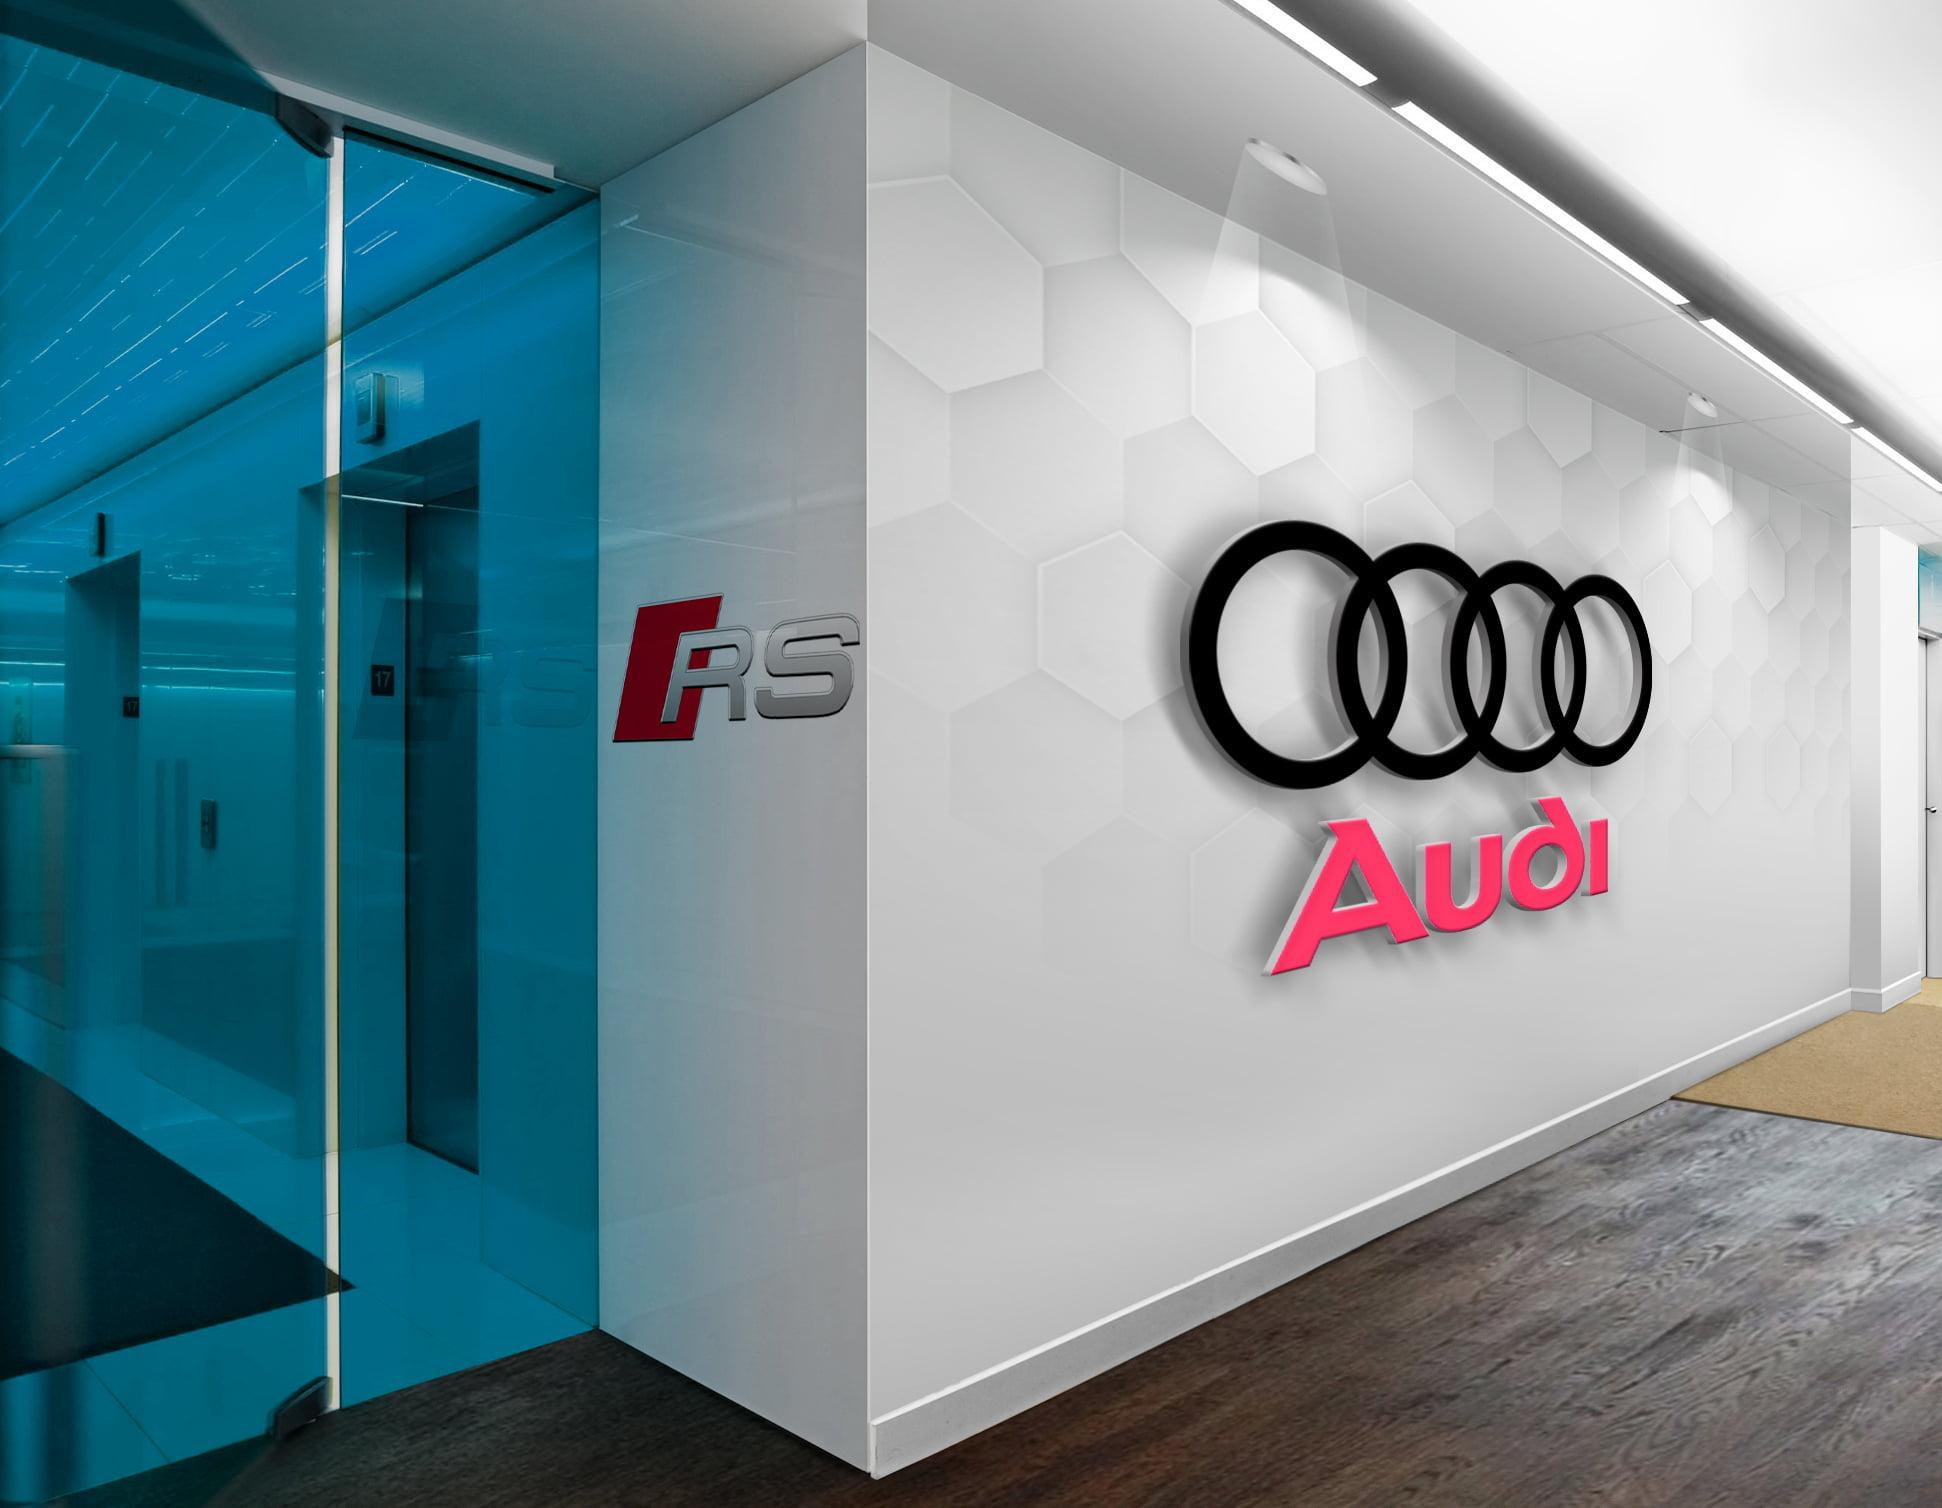 Audi-3D-Wall-Logo-&-Slogan-Mockup